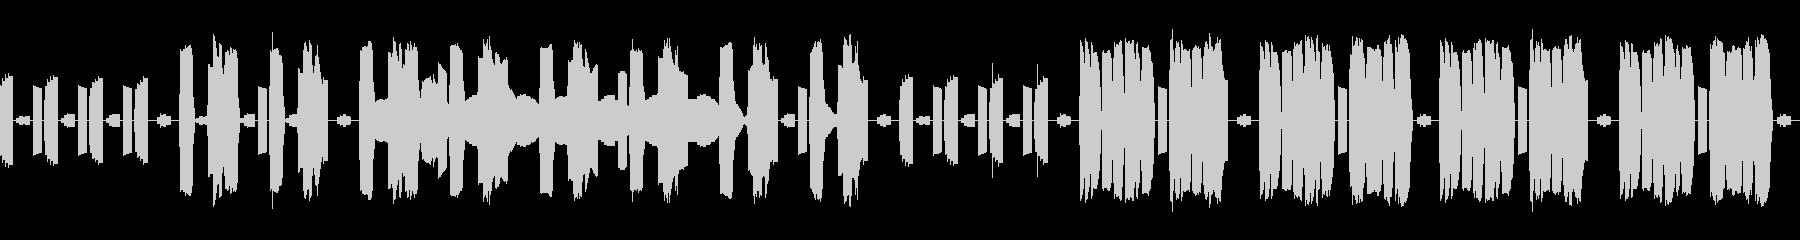 FC風音源によるバラード、ループ仕様の未再生の波形